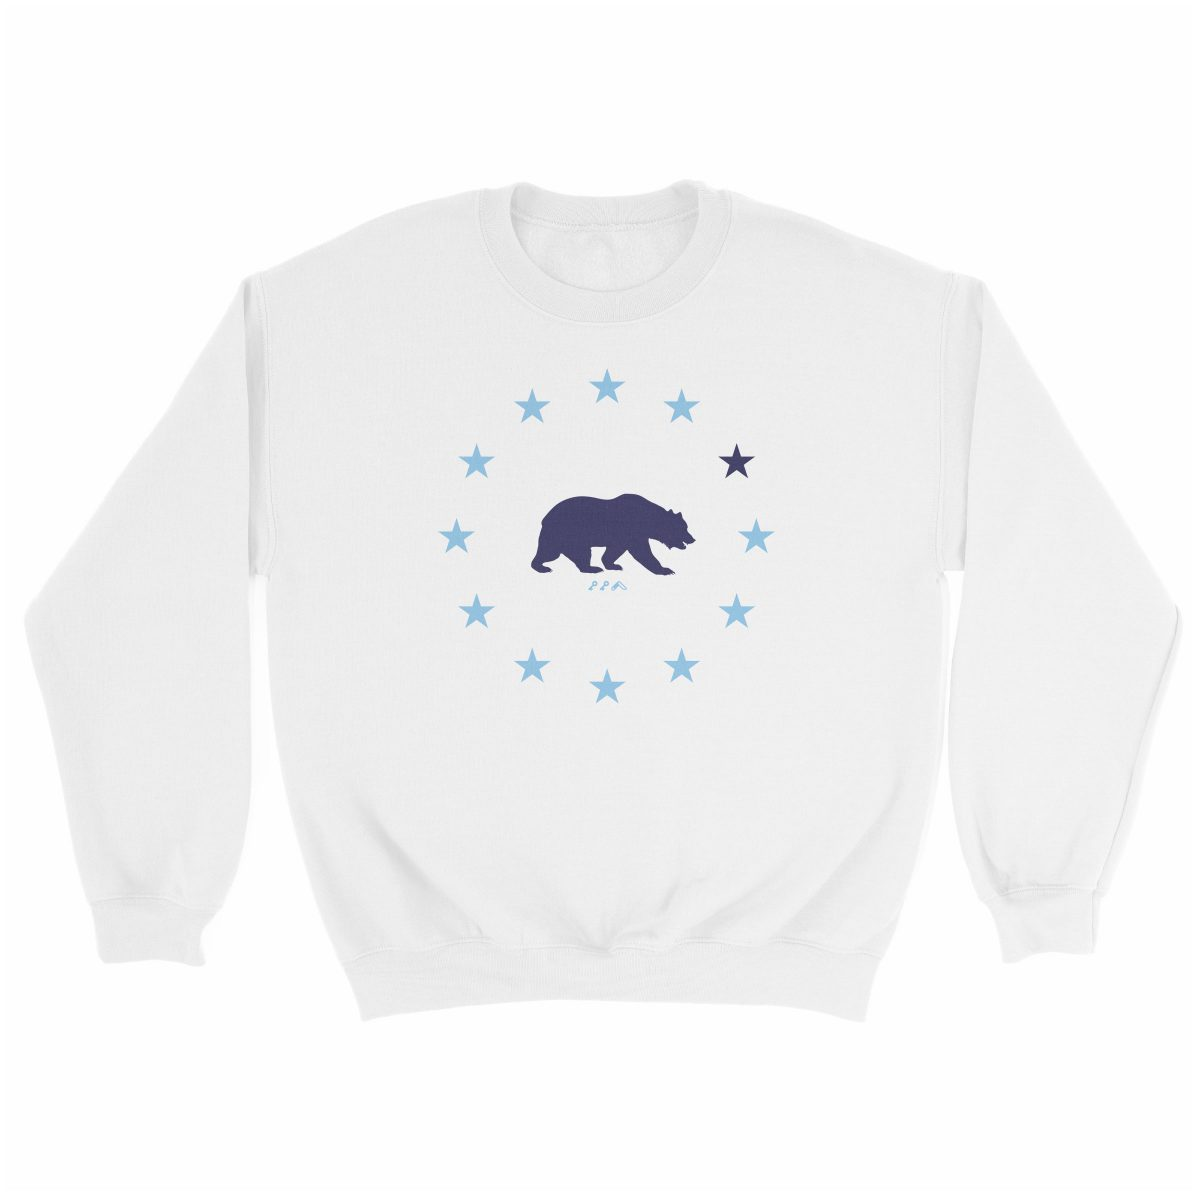 STAR GAZING cal bear california republic sweatshirt in white at kikicutt.com